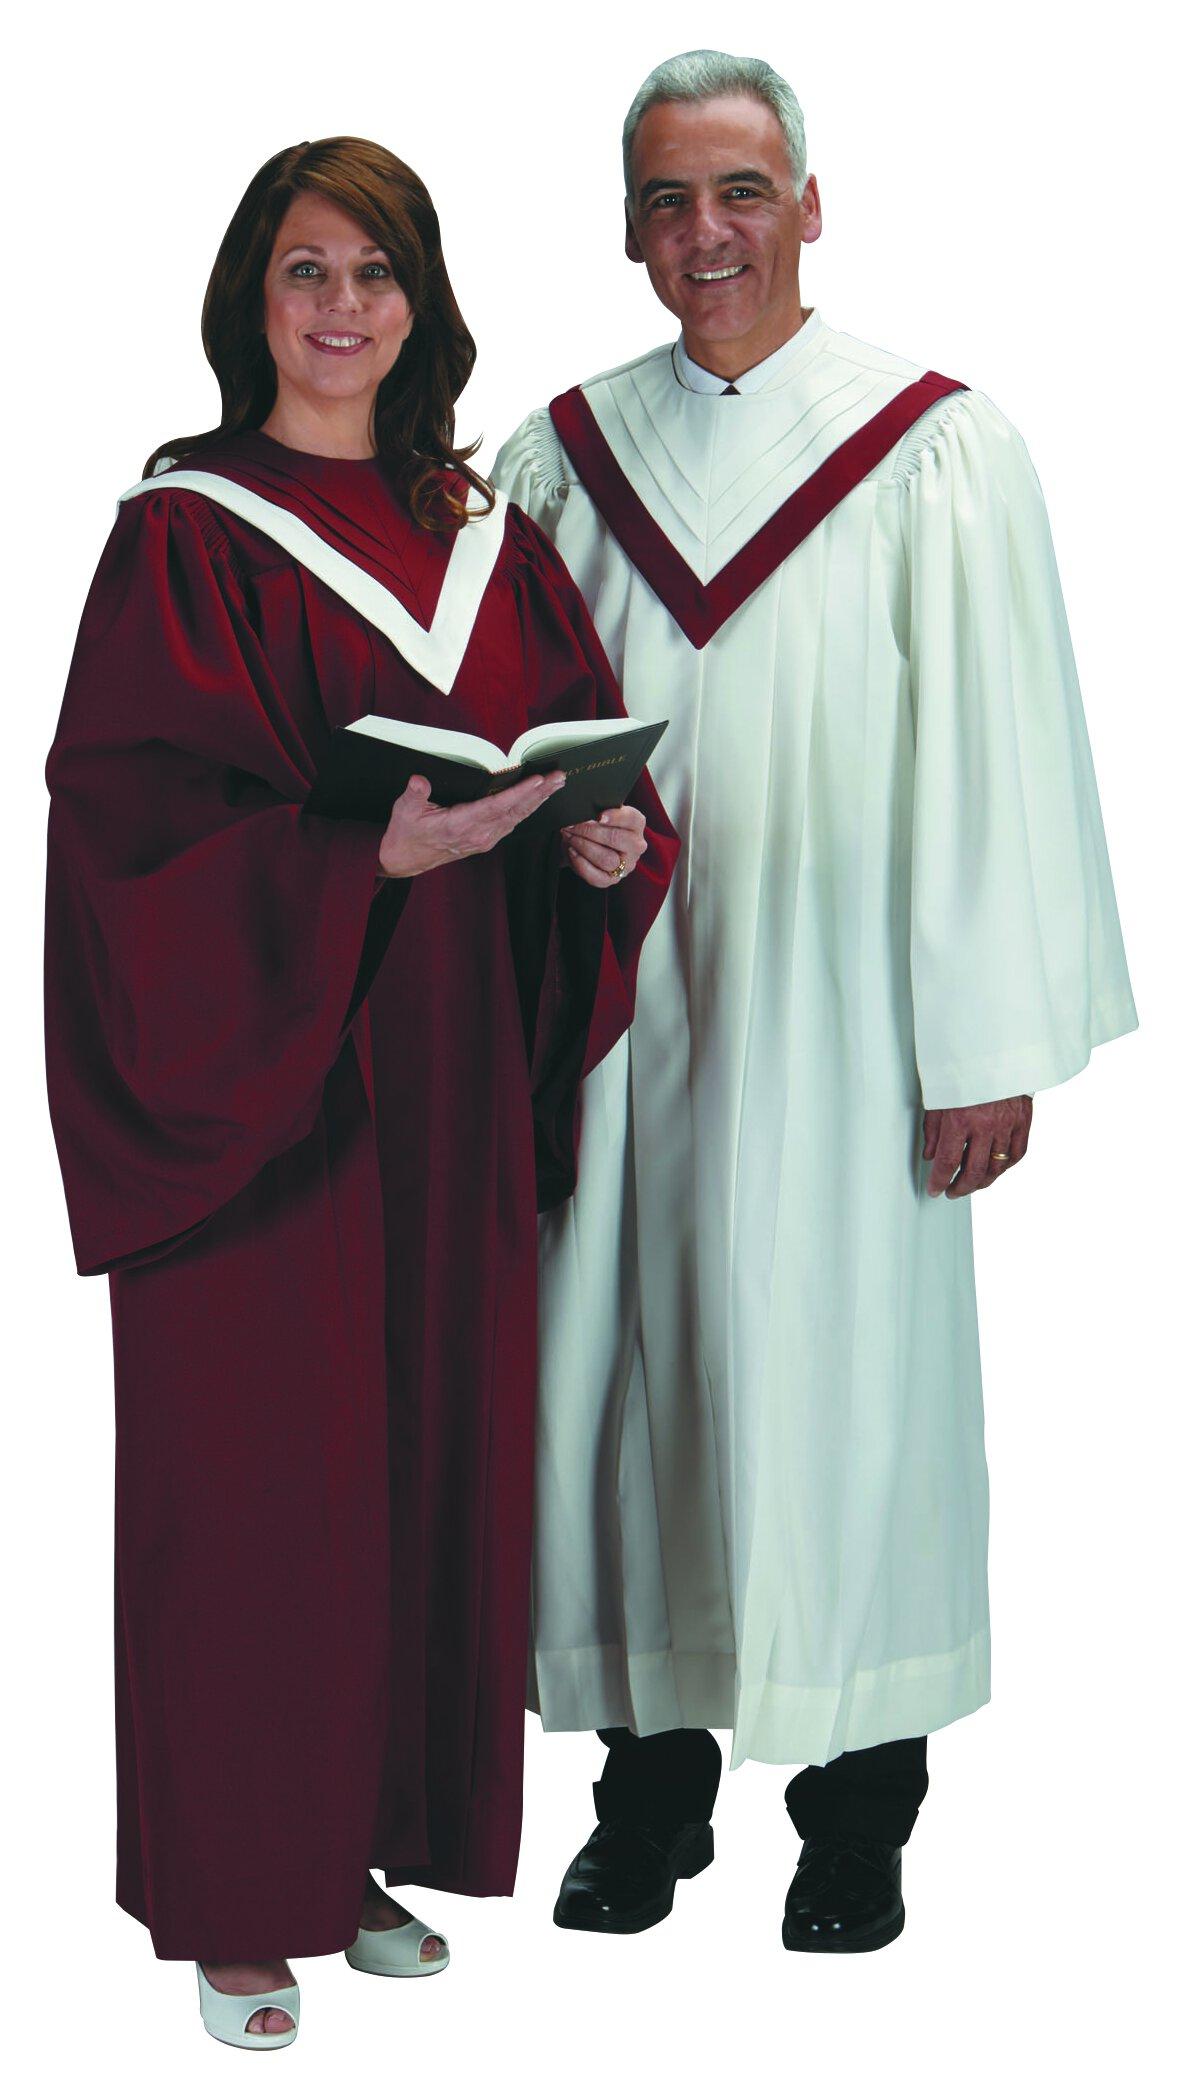 SALE, Choir Apparel & Pulpit Gowns Clearance, Closeouts | Autom